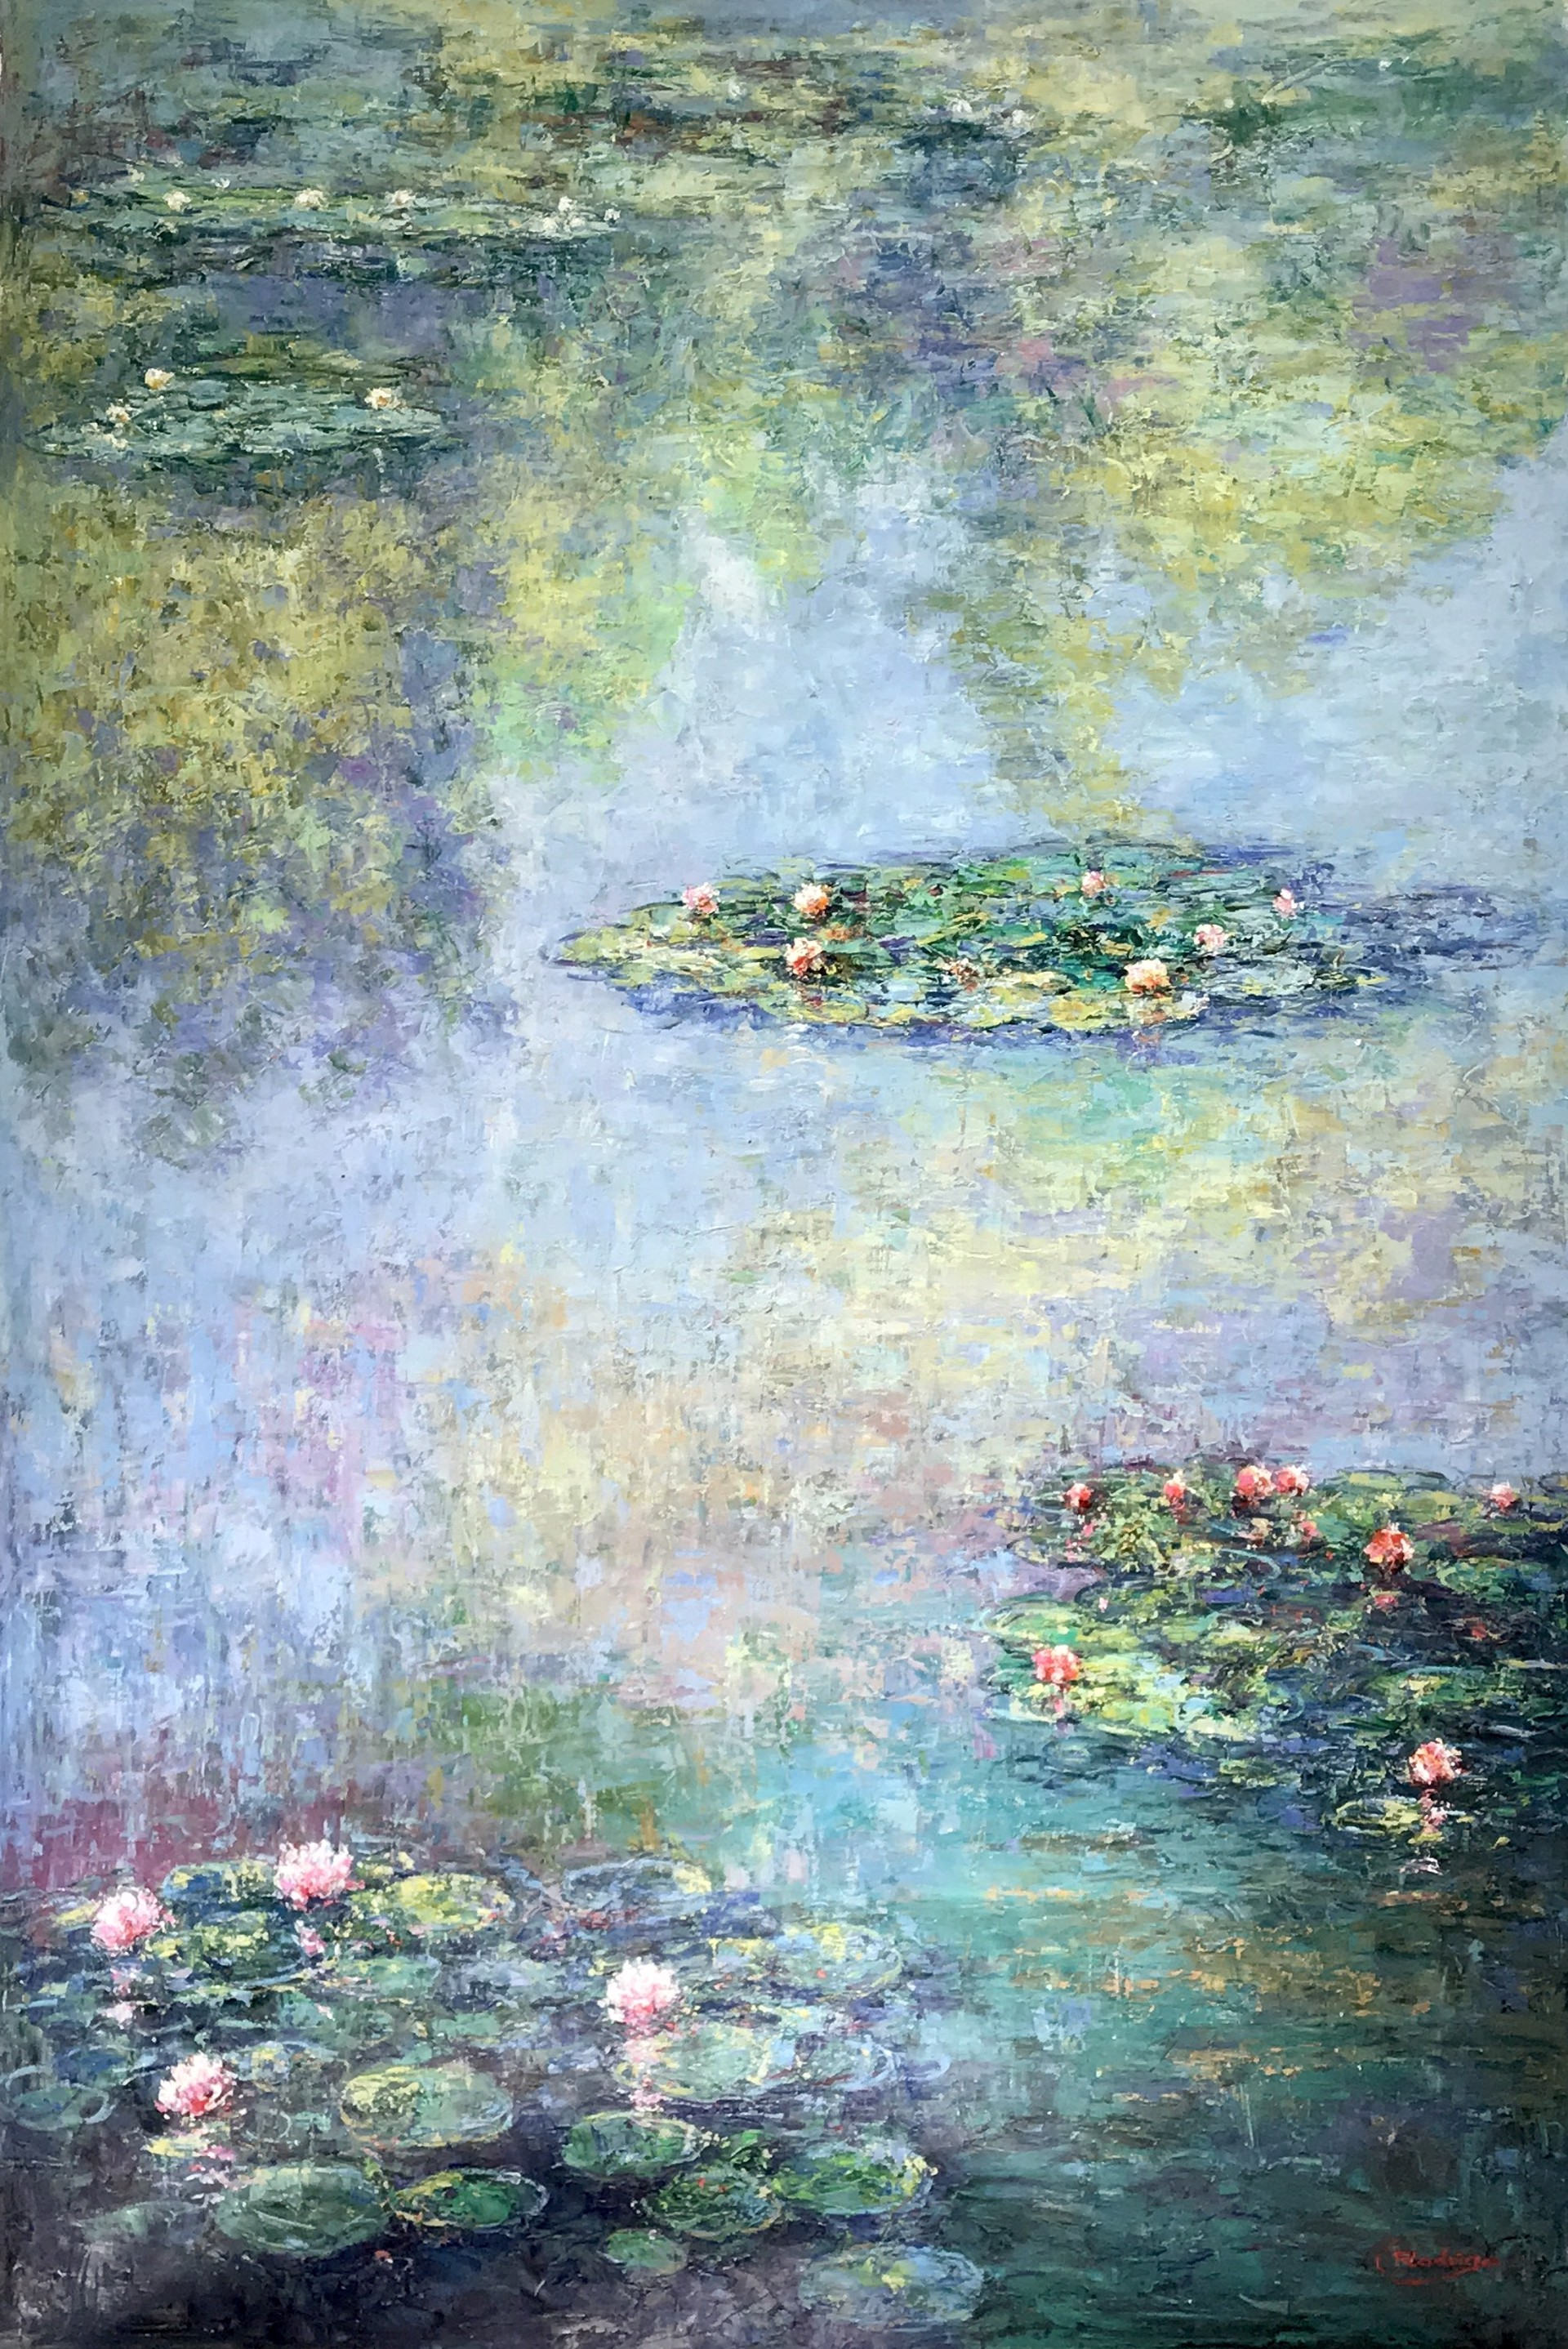 WATER LILLIES by RODRIGO